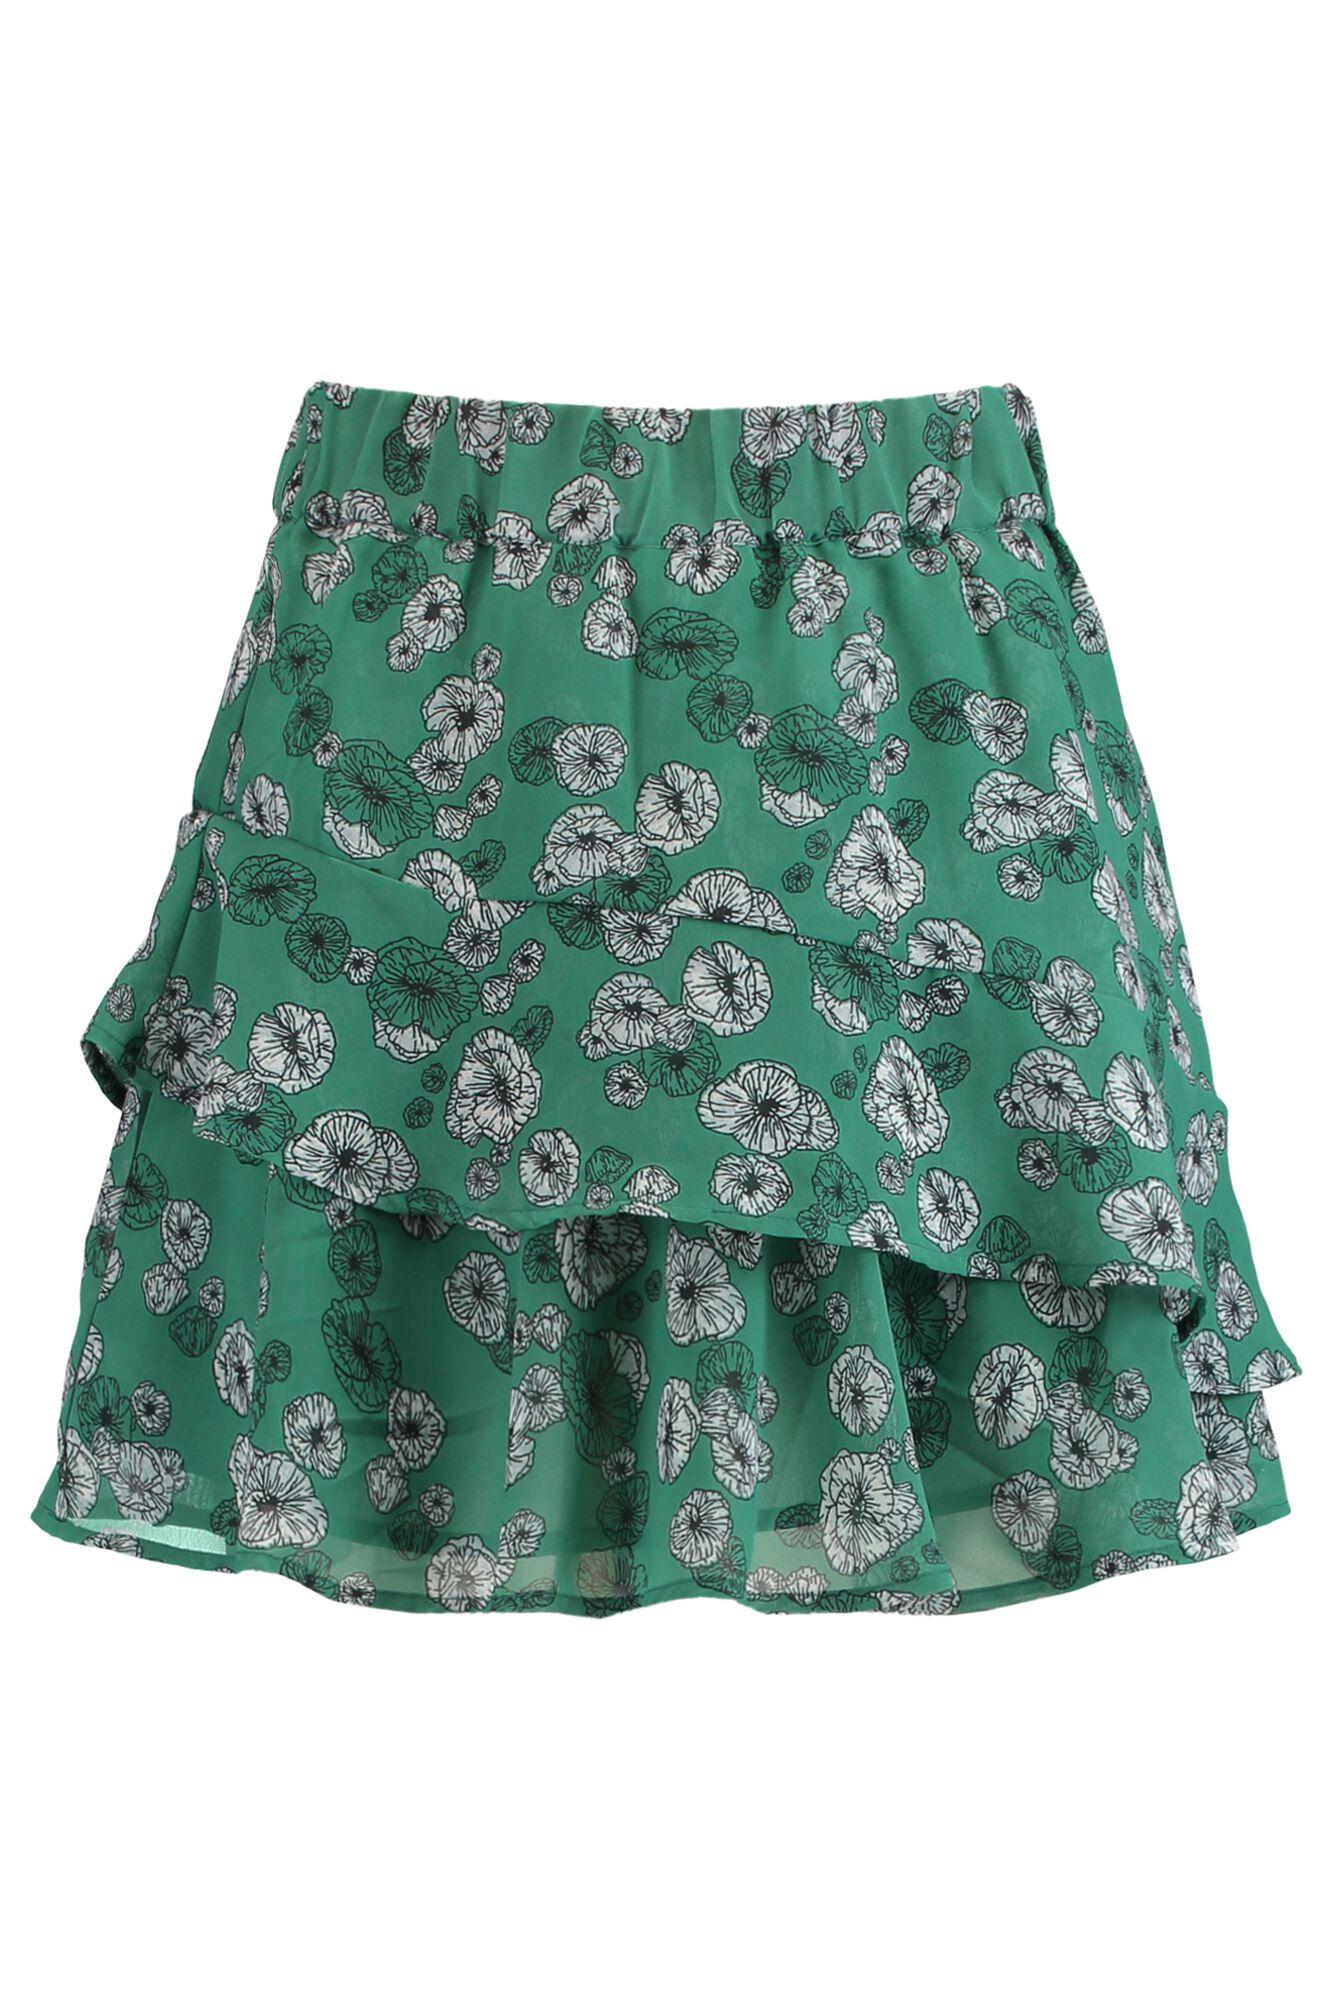 01bae00d5ac8 Women Skirt Riley Green Buy Online | America Today